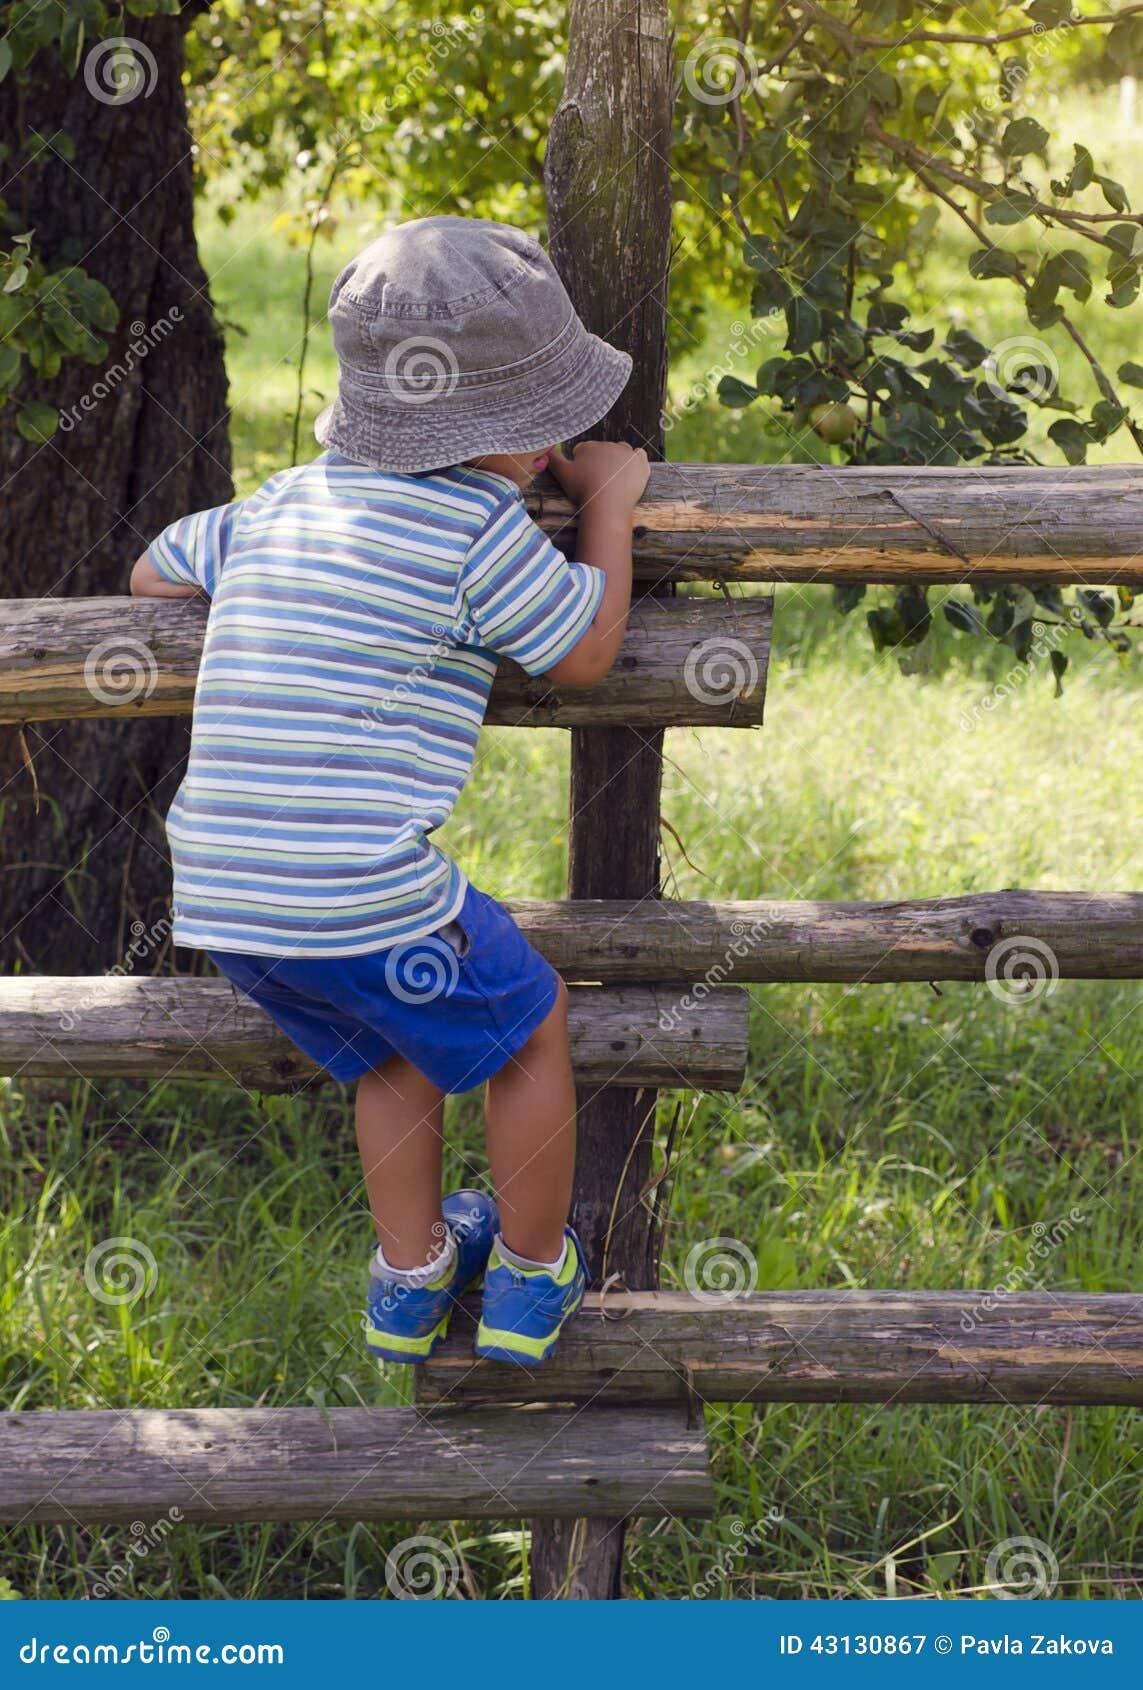 Child climbing the fence